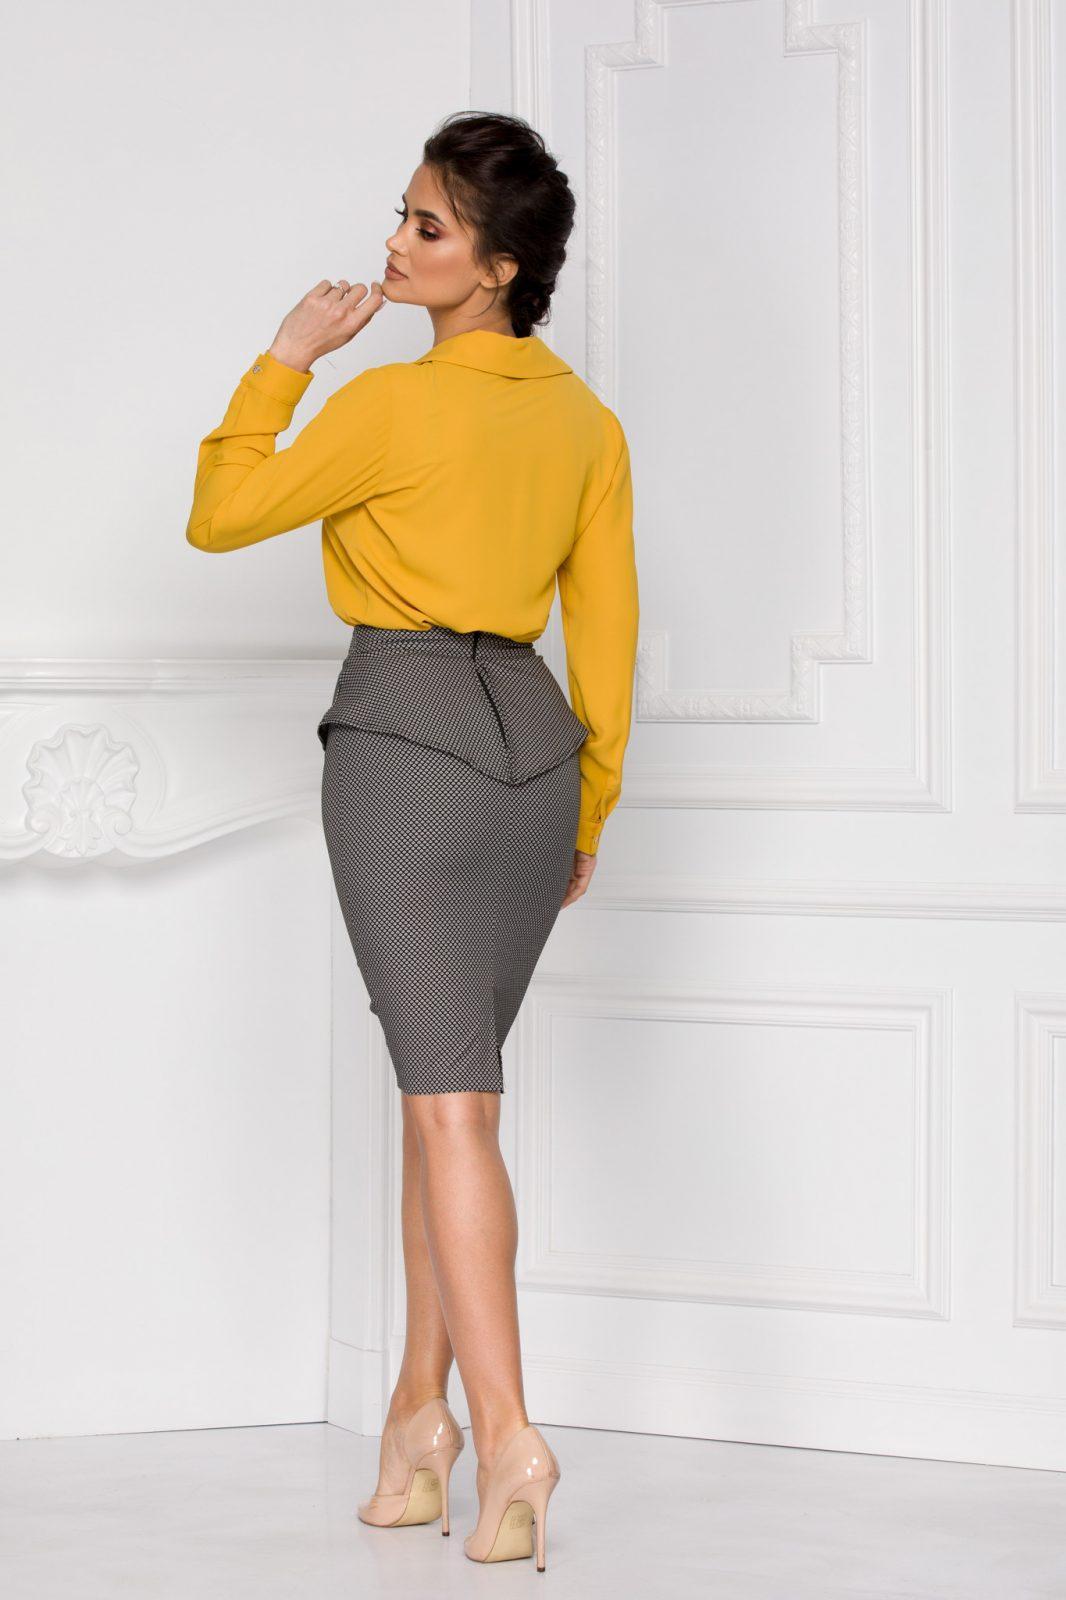 Sya Κίτρινη Μπλούζα 6002